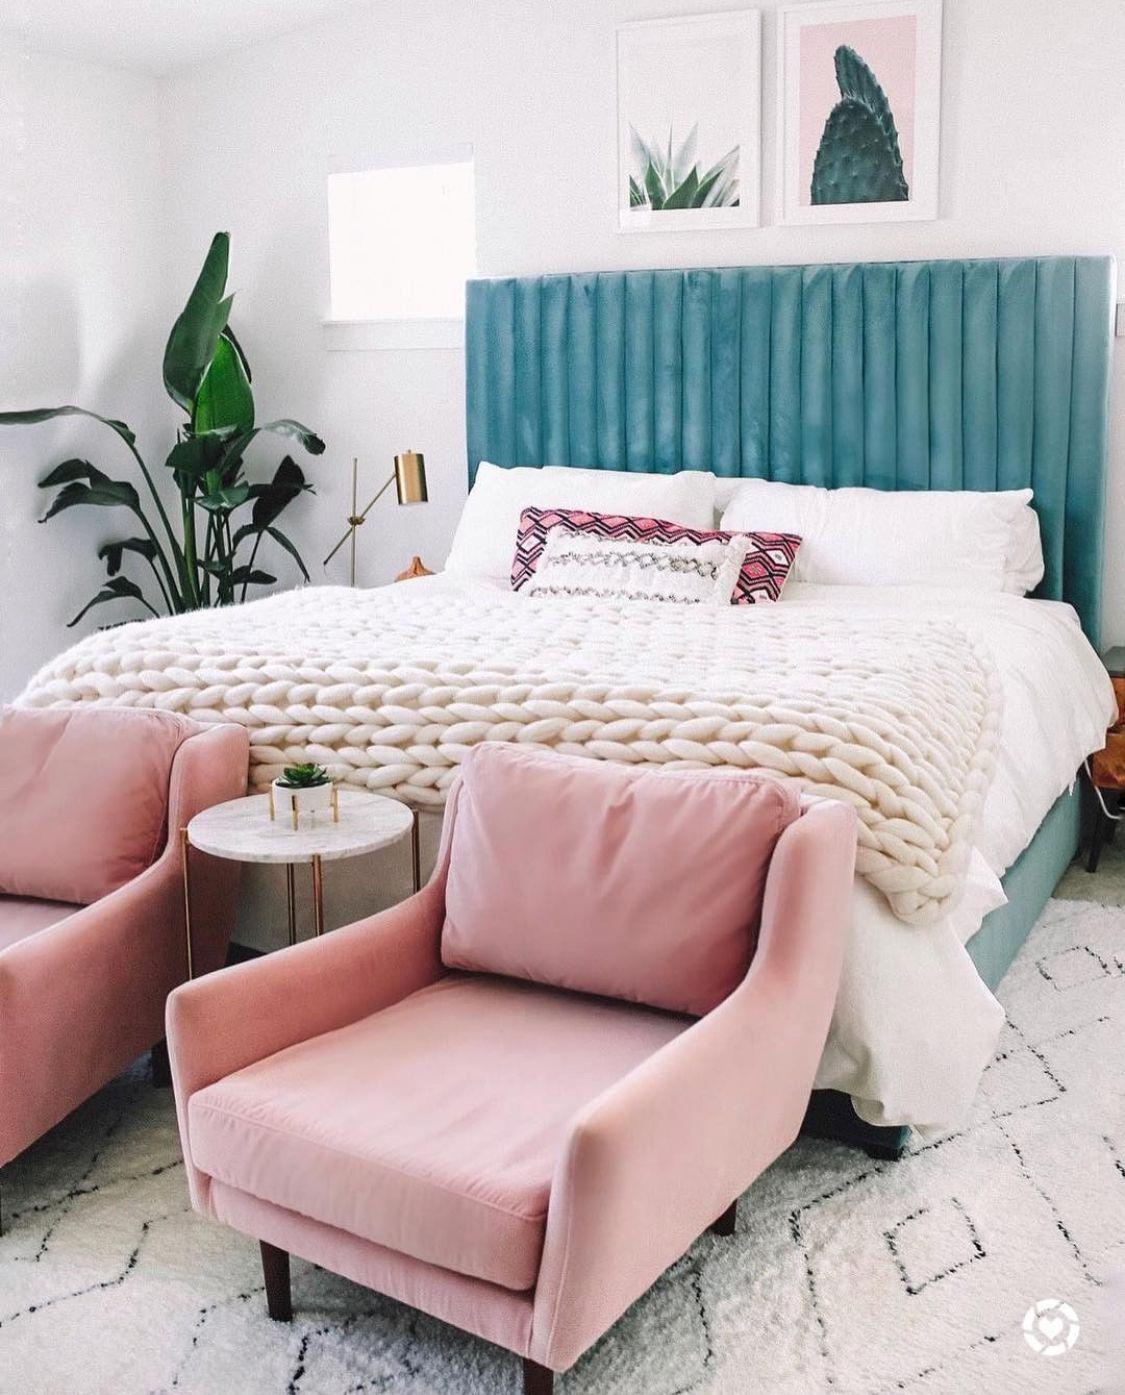 Boho Chic Style Bedroom Modern Bohemian Luxe Home Decor ... on Boho Bedroom Modern  id=25181